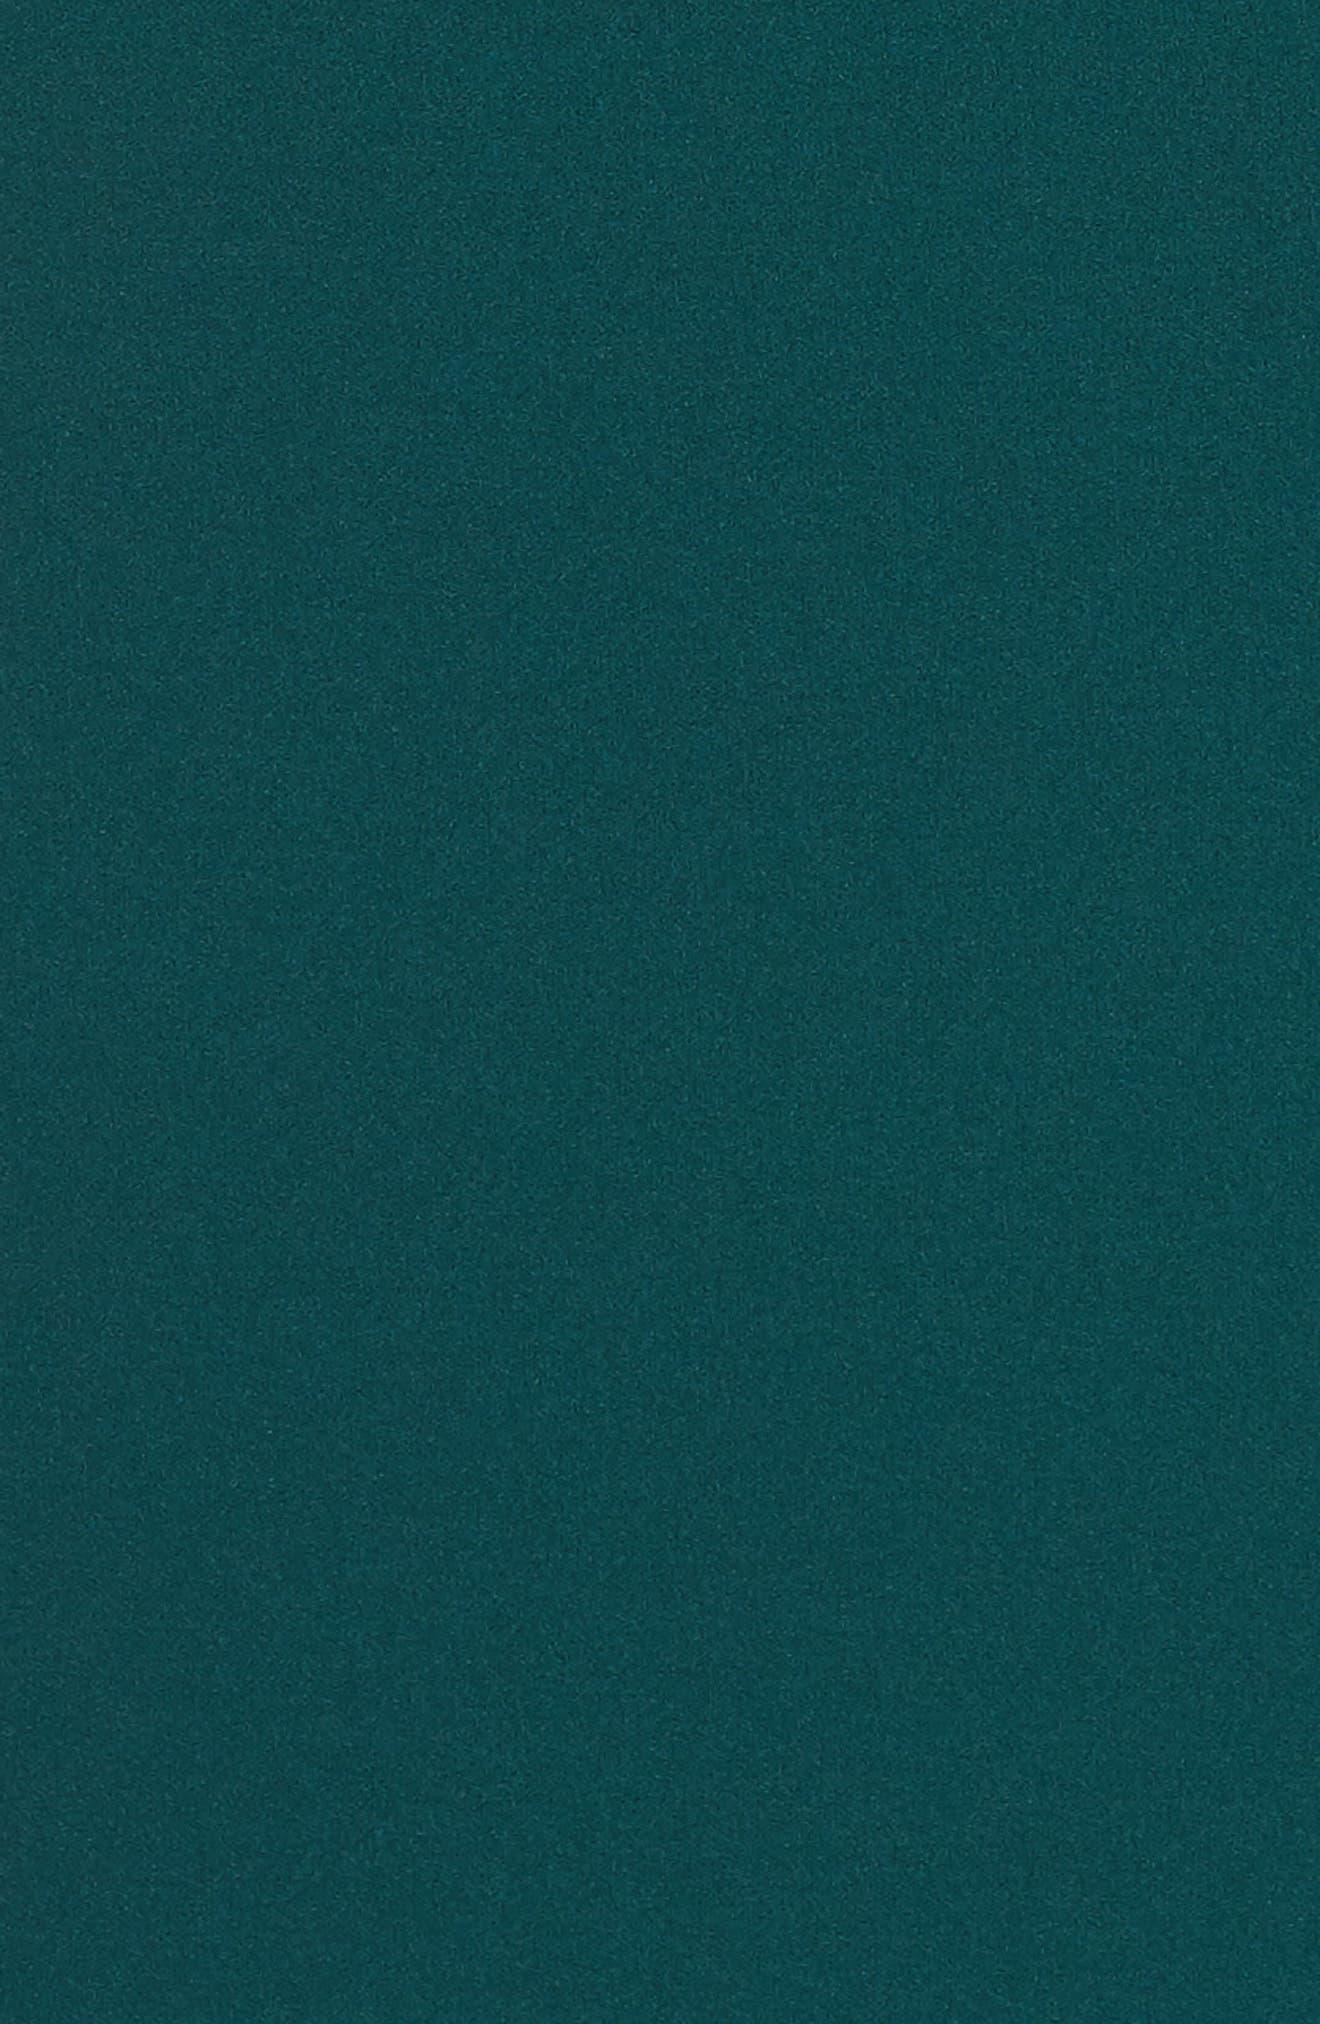 Scuba Crepe Sheath Dress,                             Alternate thumbnail 5, color,